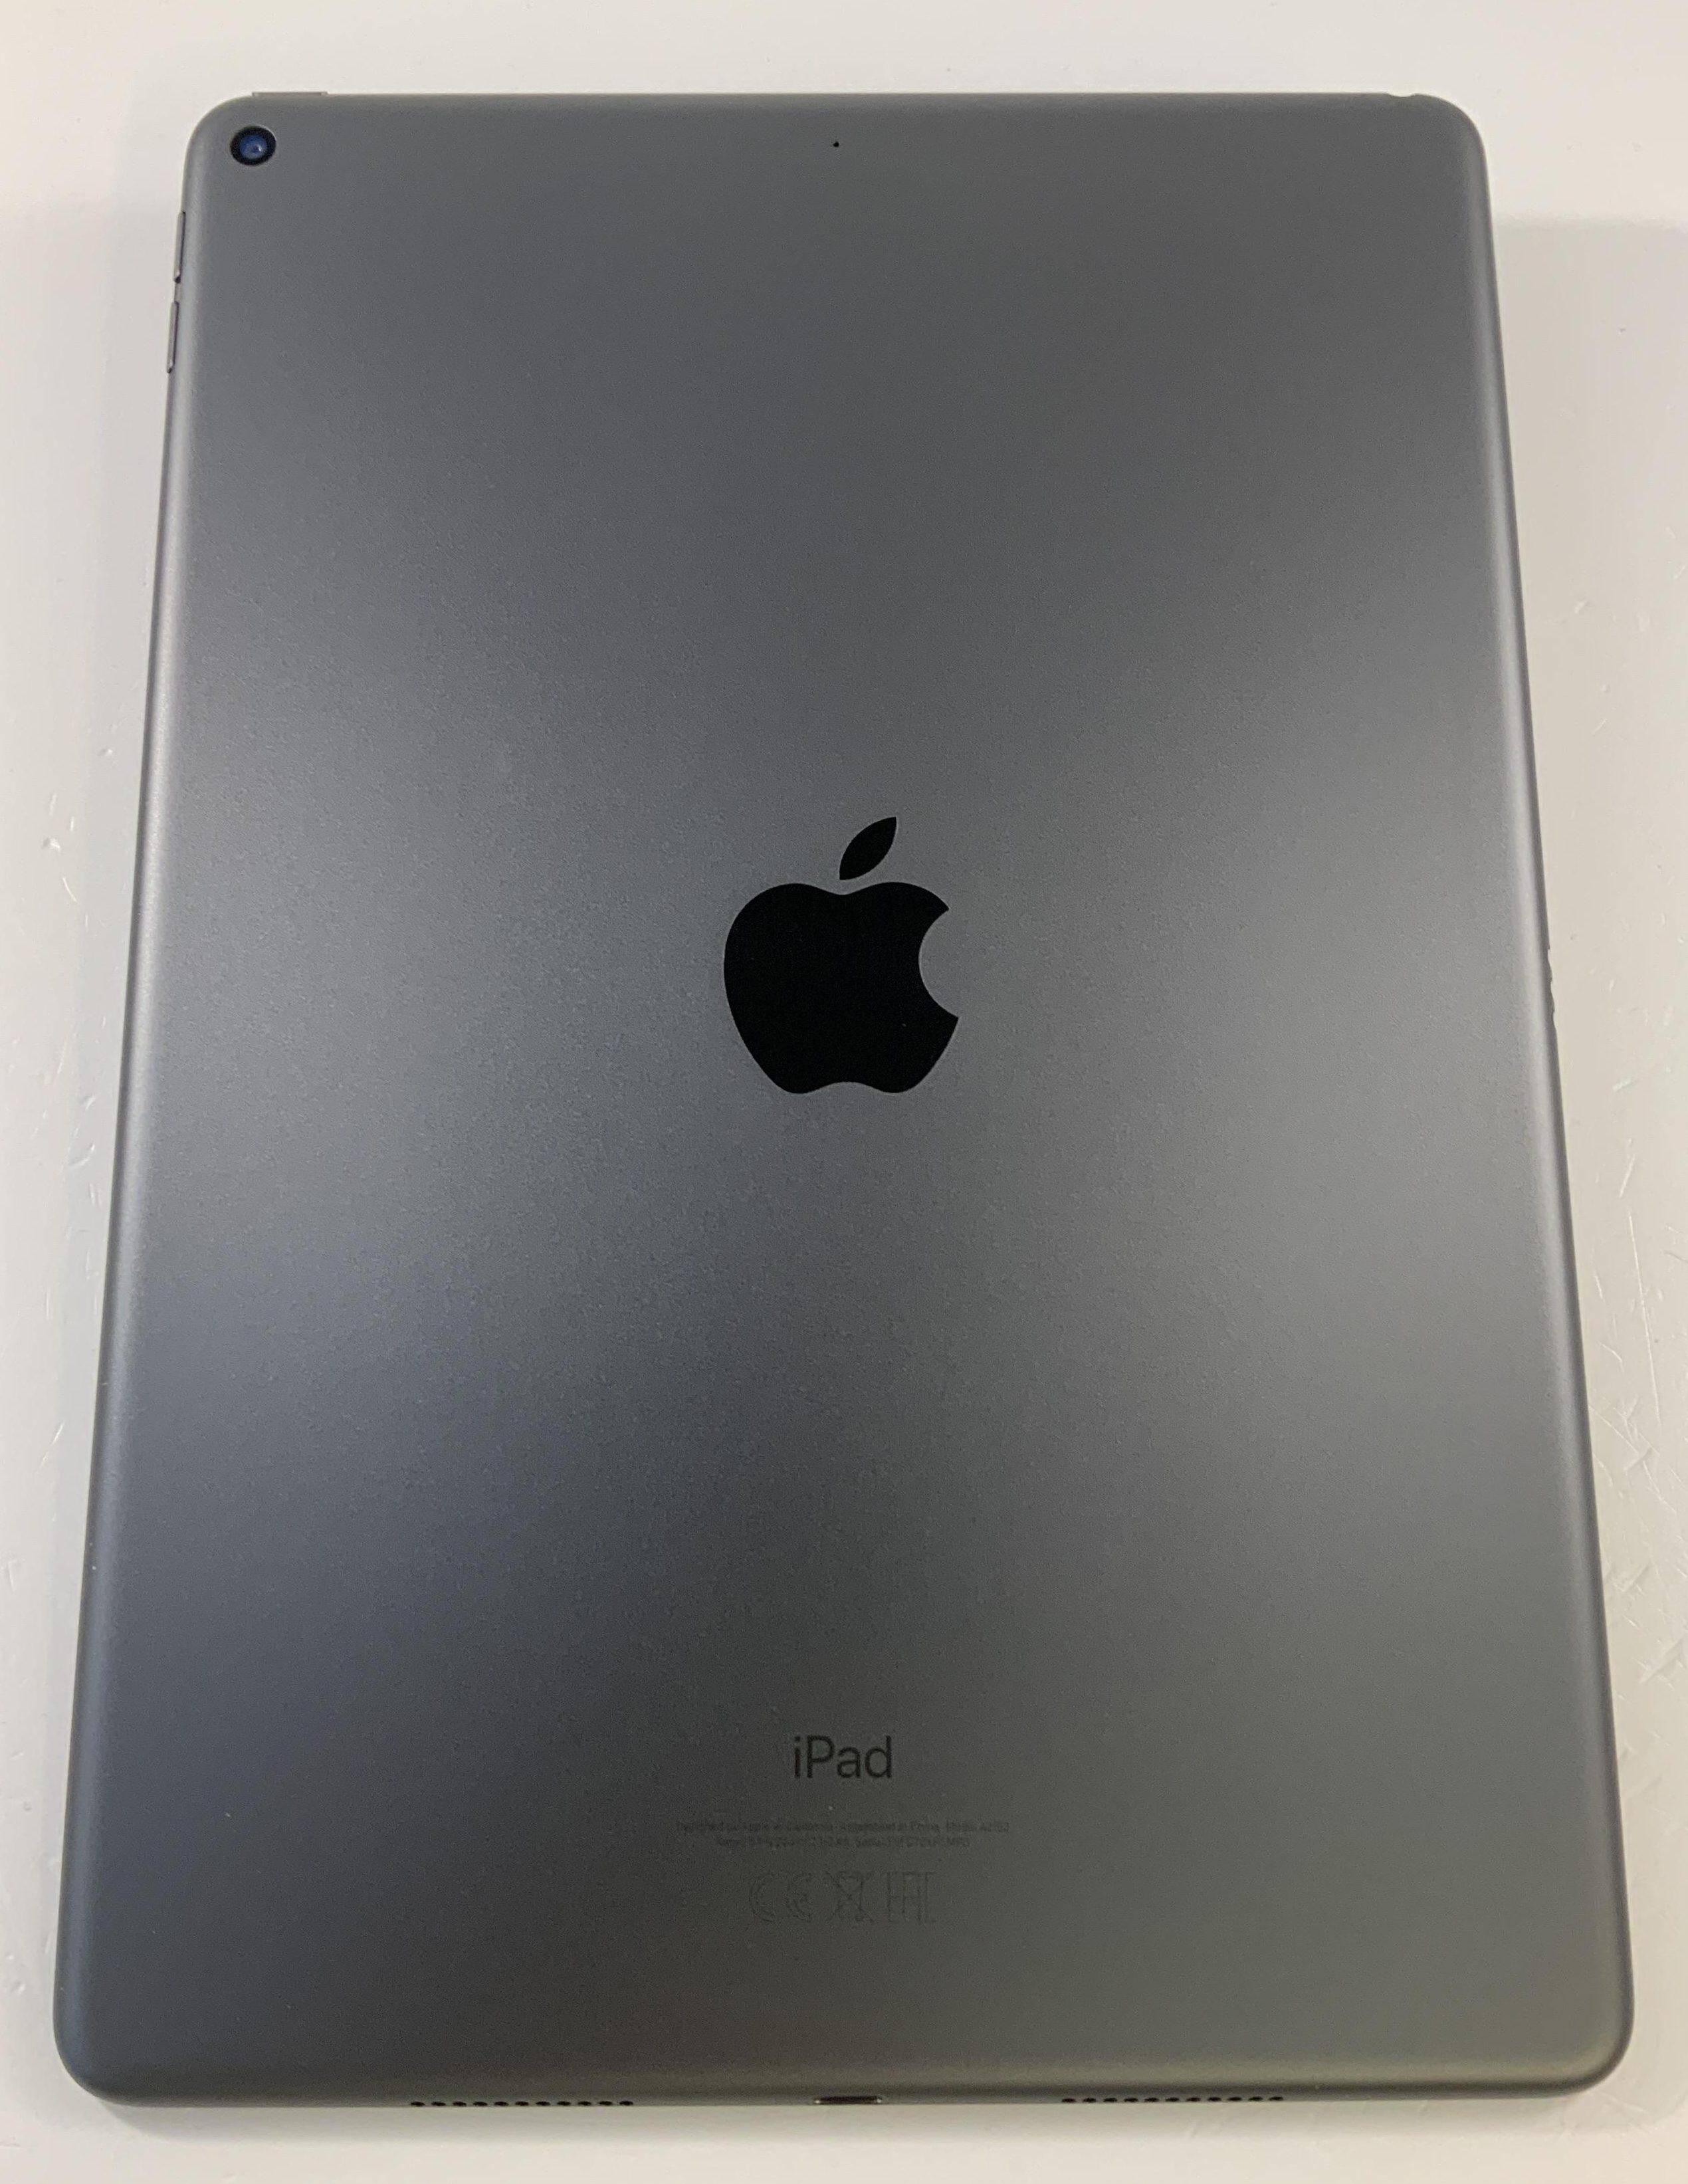 iPad Air 3 Wi-Fi 64GB, 64GB, Space Gray, immagine 2